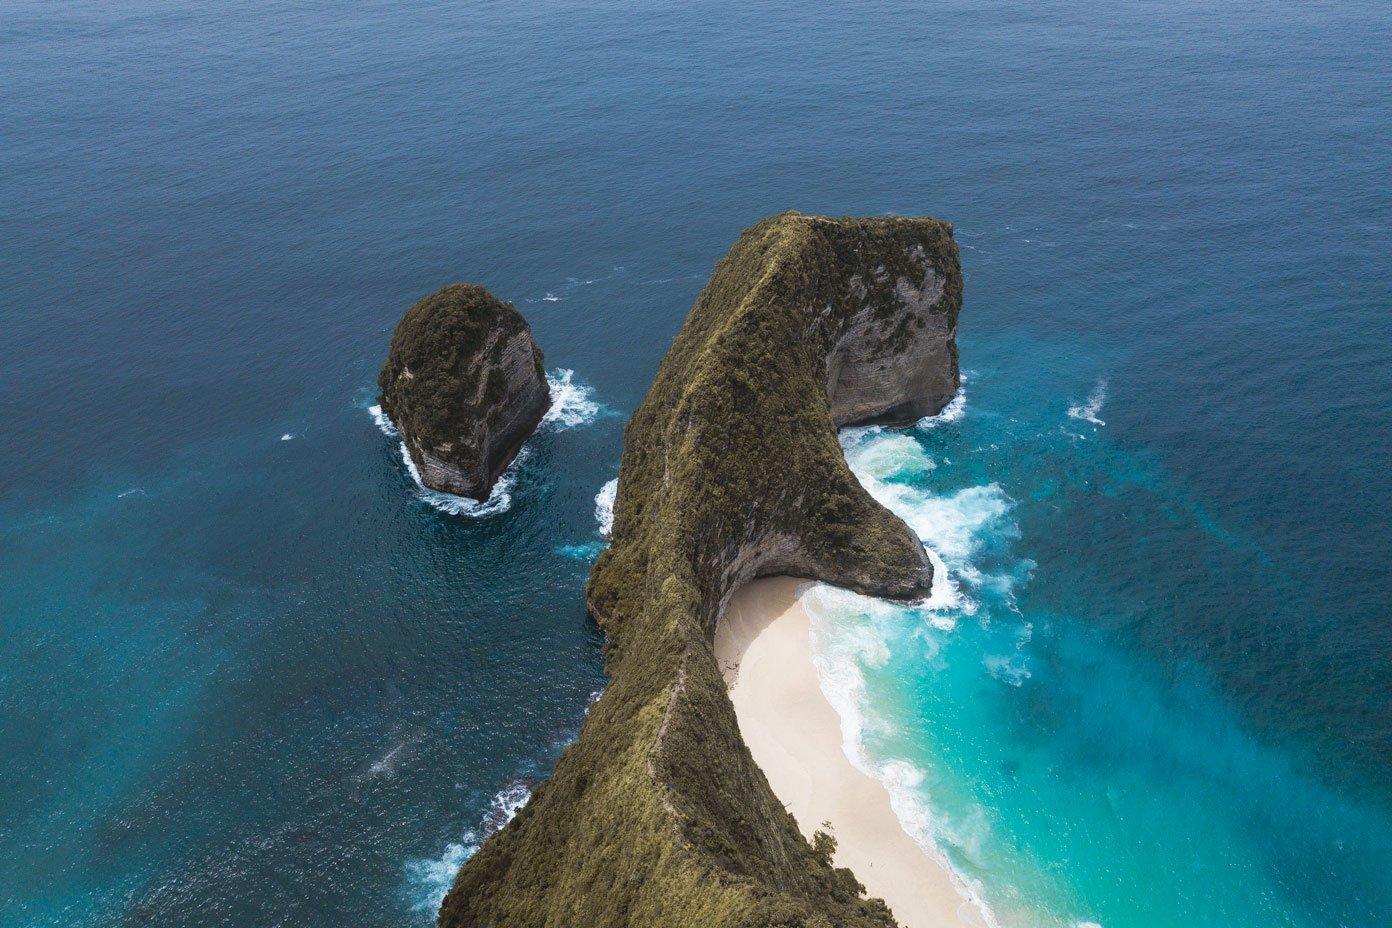 Bali Drone Shot